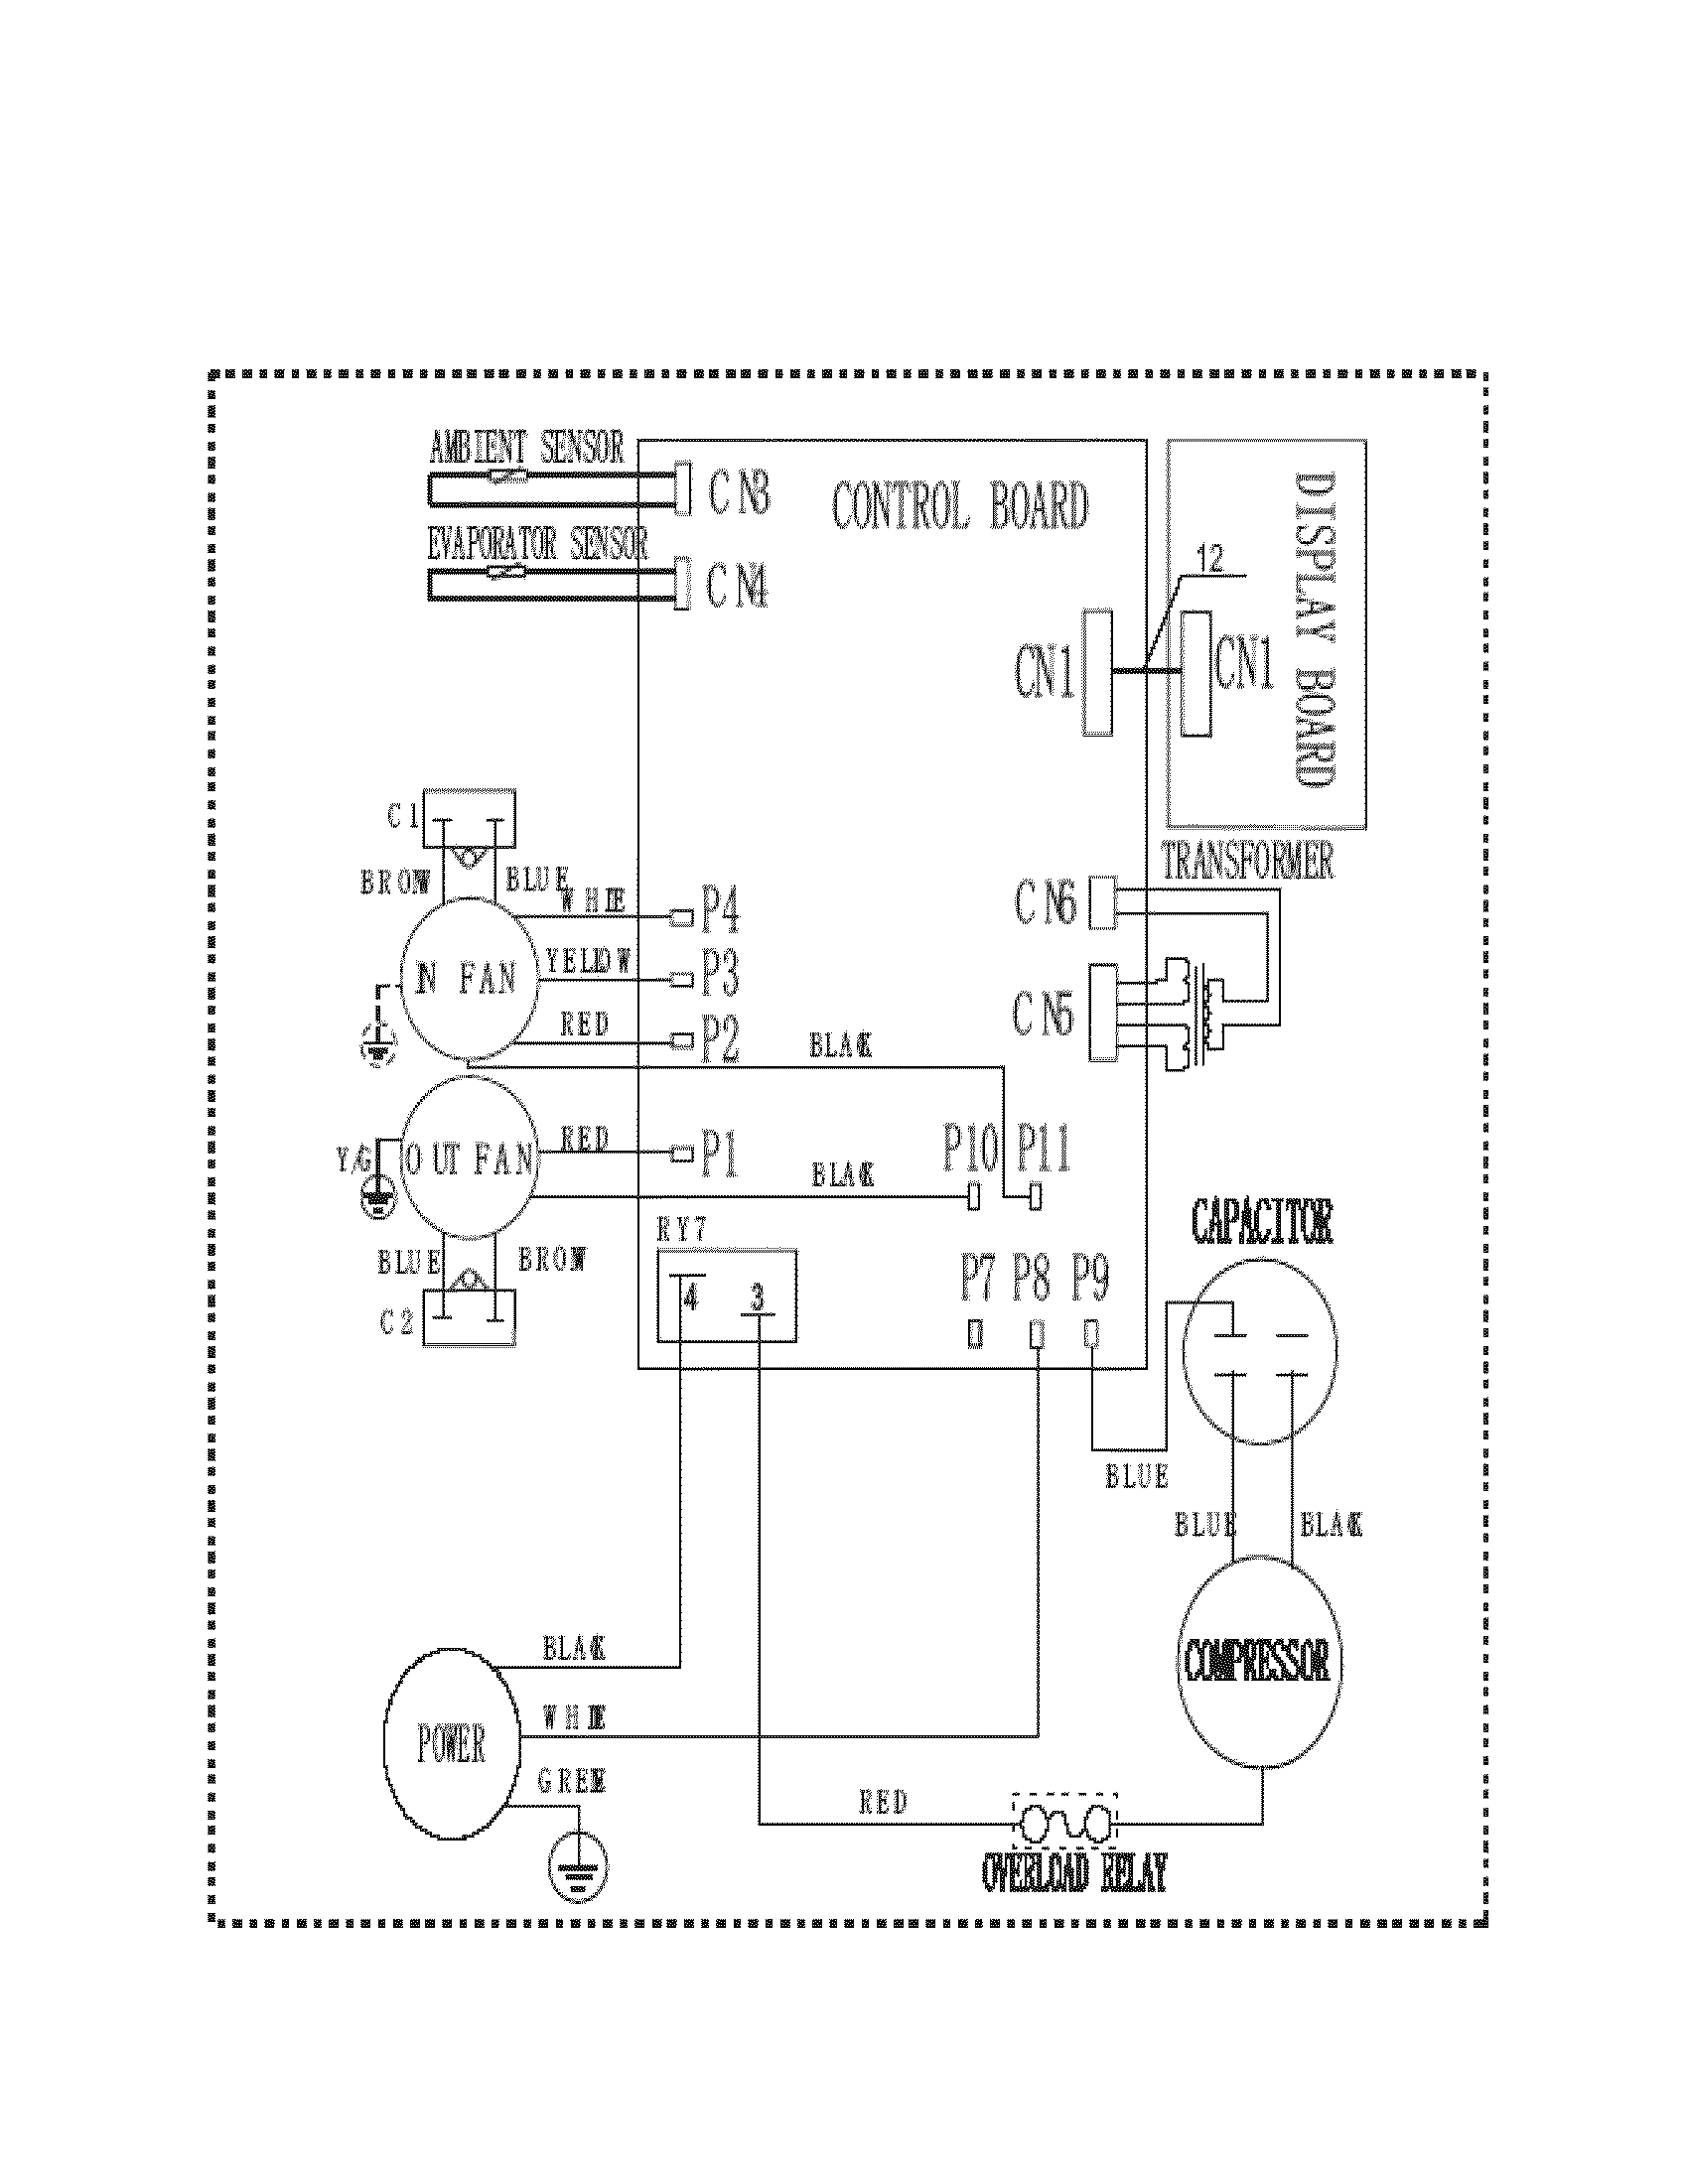 trane weathertron heat pump thermostat wiring diagram